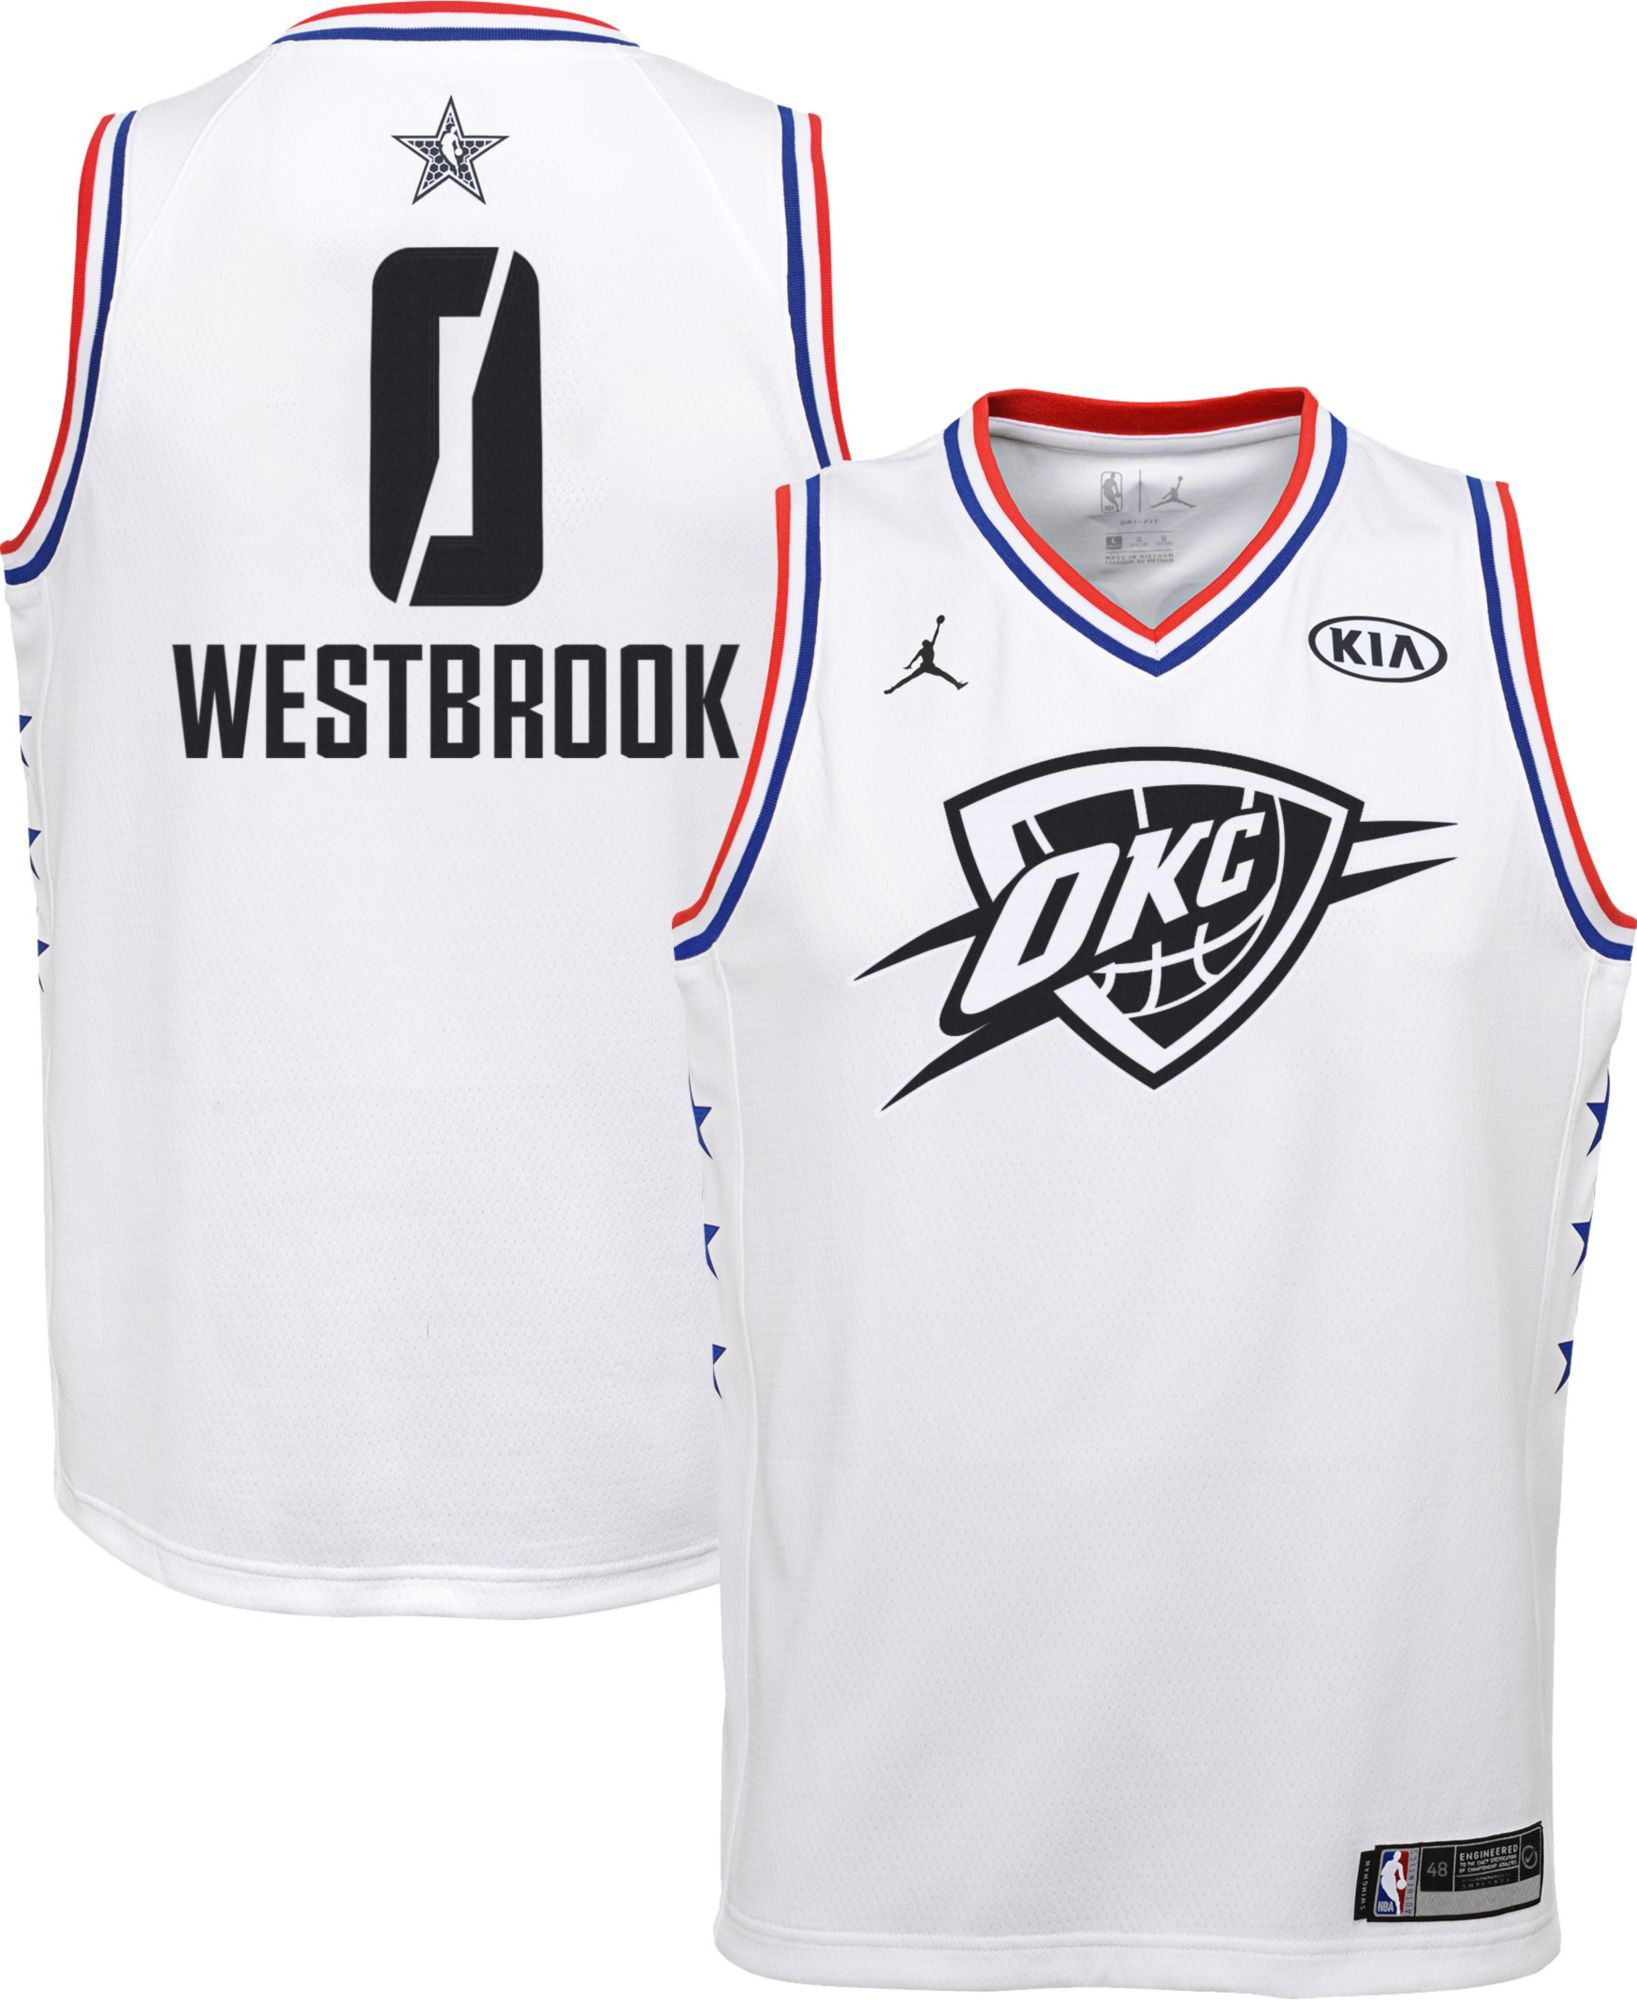 85cf202bf Jordan Youth 2019 NBA All-Star Game Russell Westbrook White Dri-FIT  Swingman Jersey